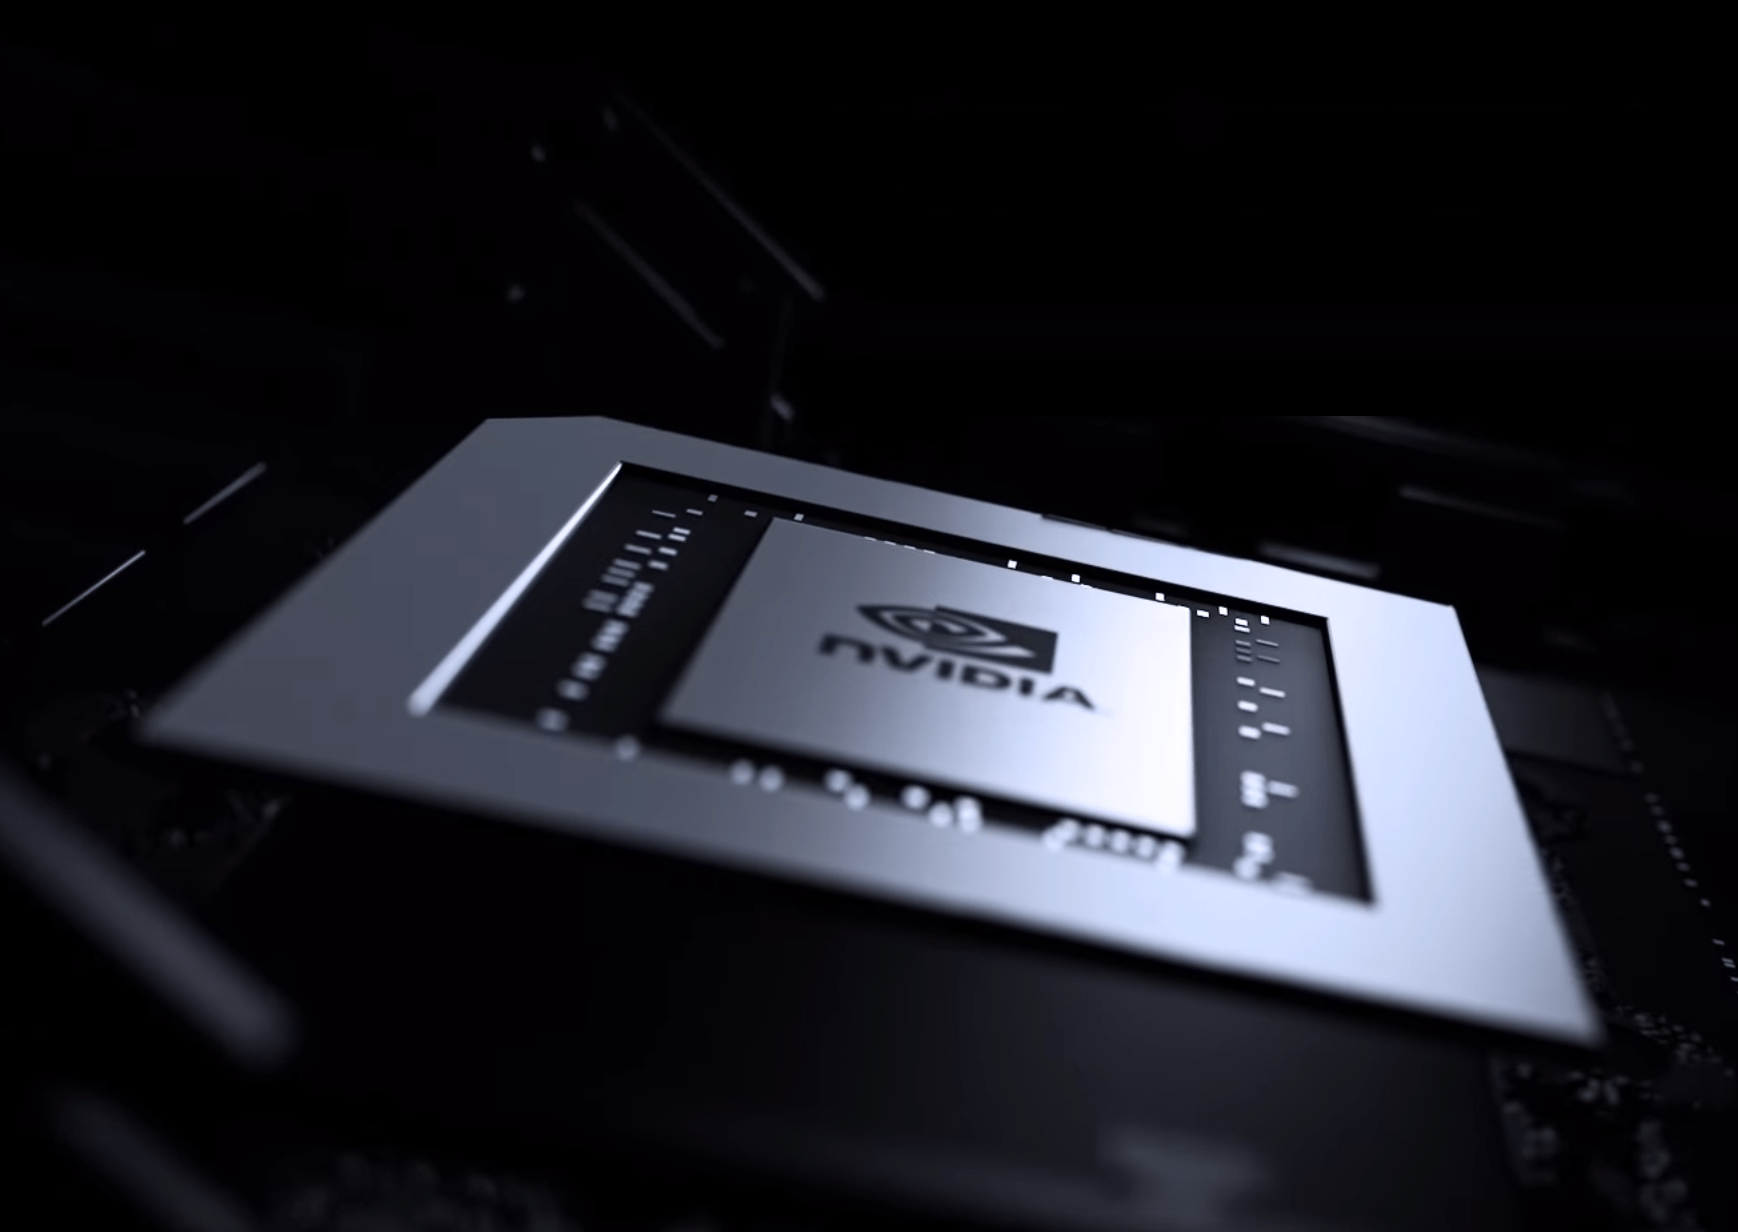 Spesifikasi & Benchmark NVIDIA GeForce RTX 3070 Mobility GPU Bocor